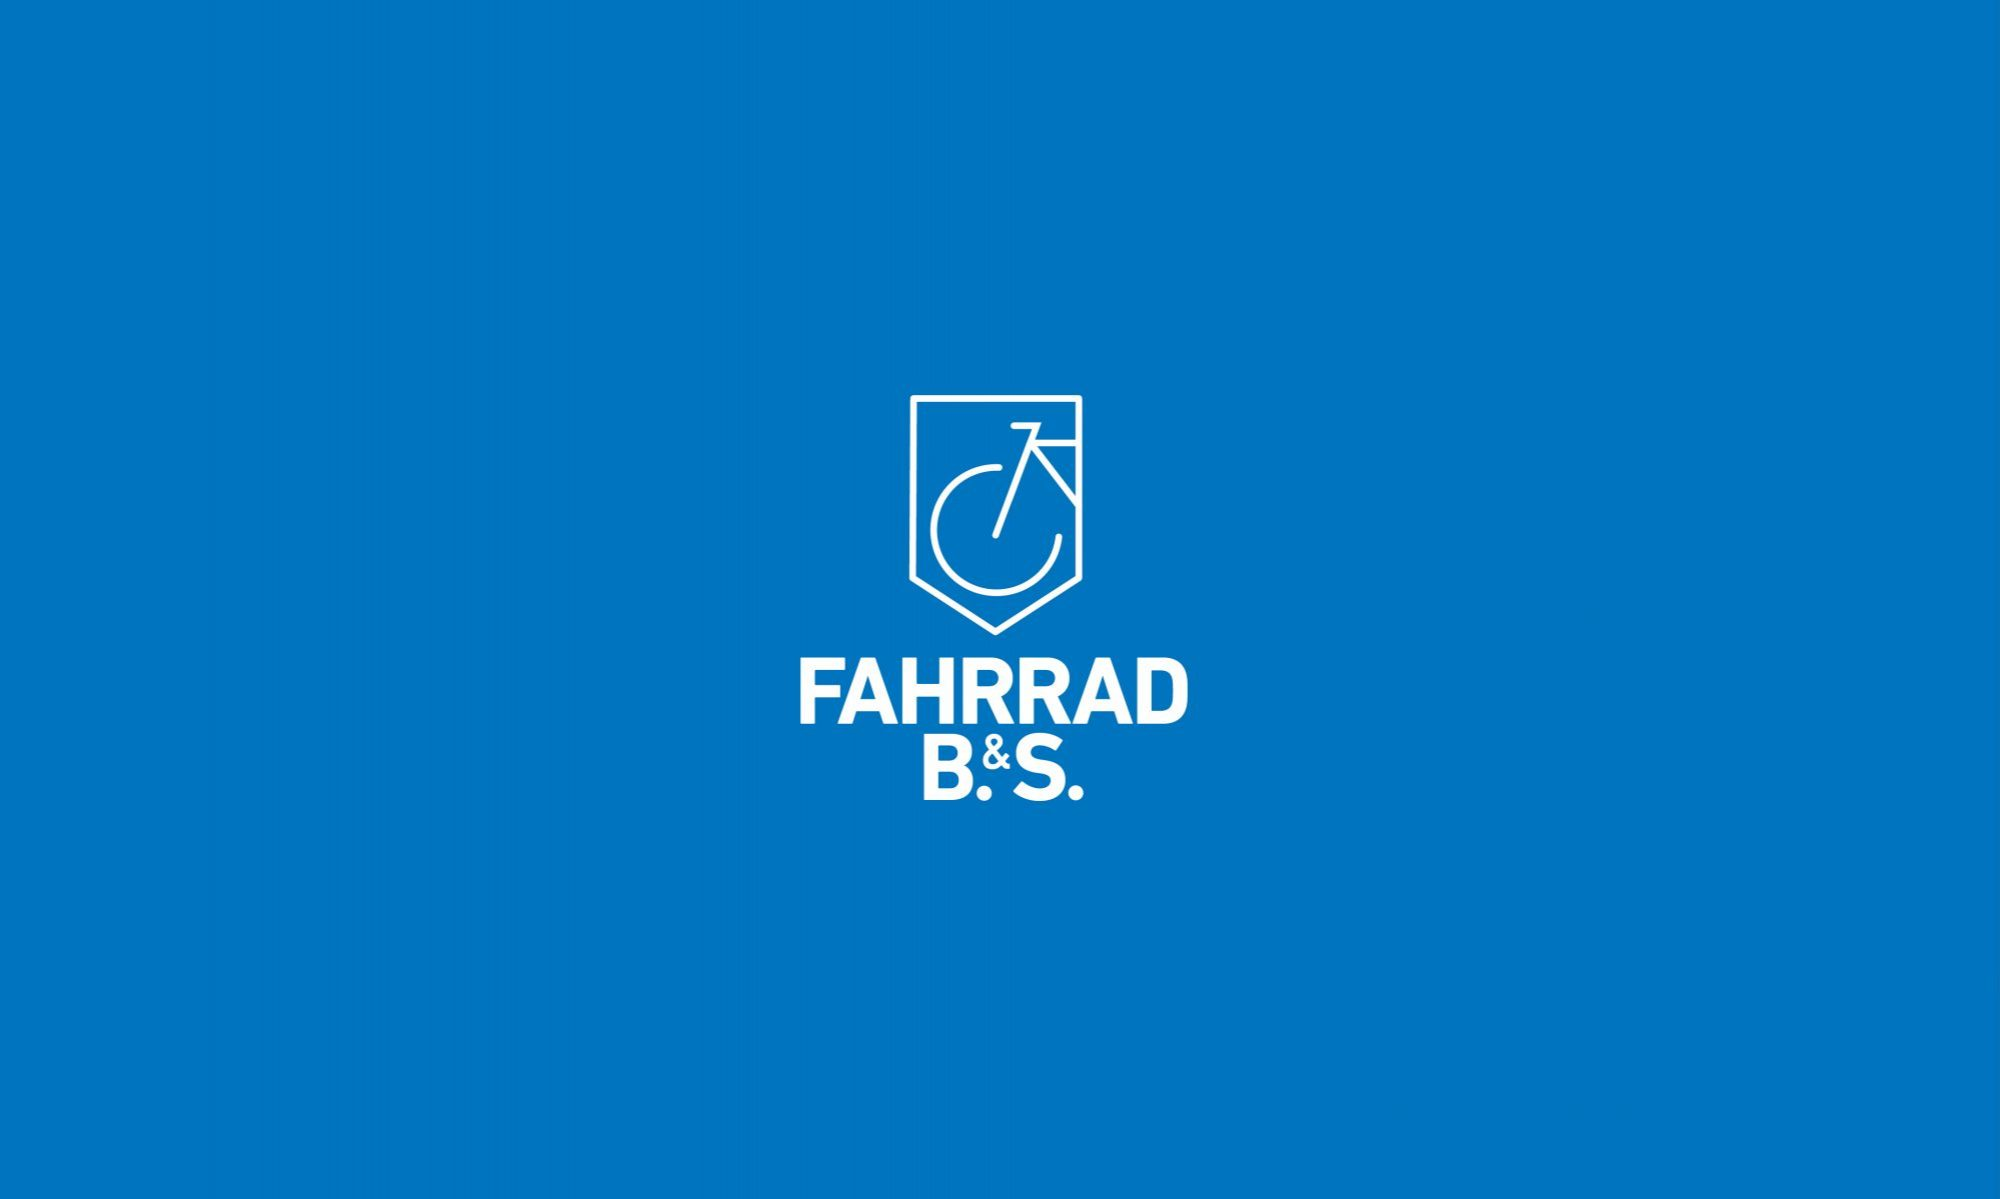 Fahrrrad B.&S.